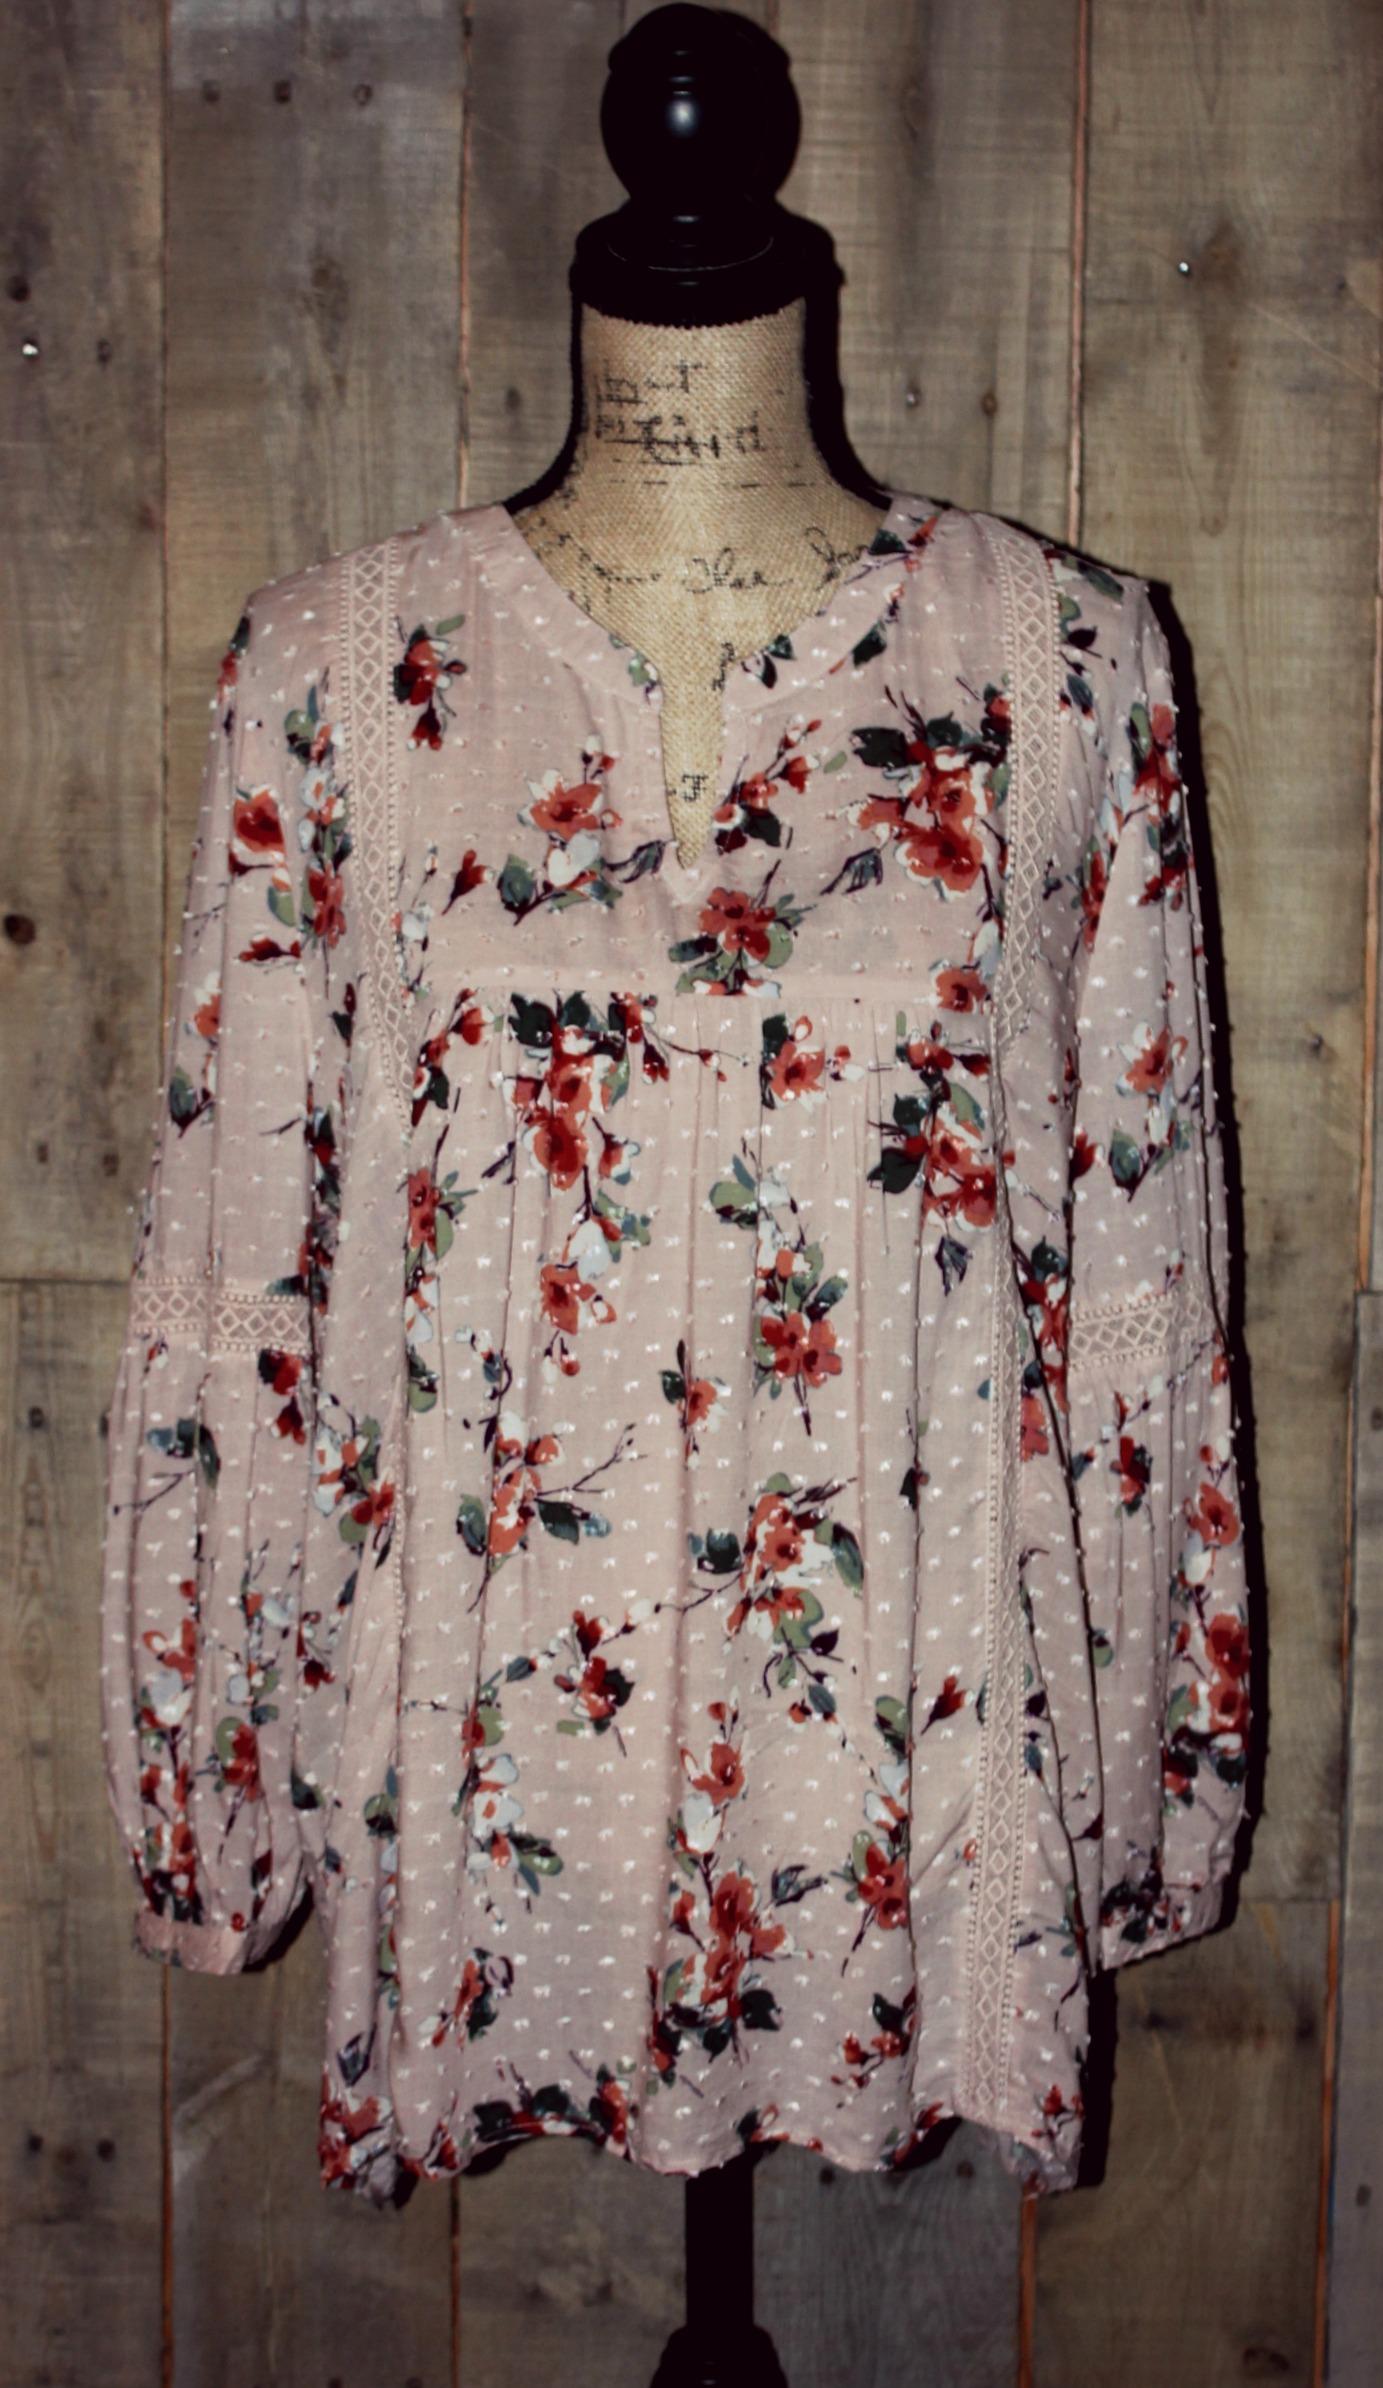 373271f6c5d5 Blu Pepper Long Sleeve Dusty Pink Floral Top - Copper Wings